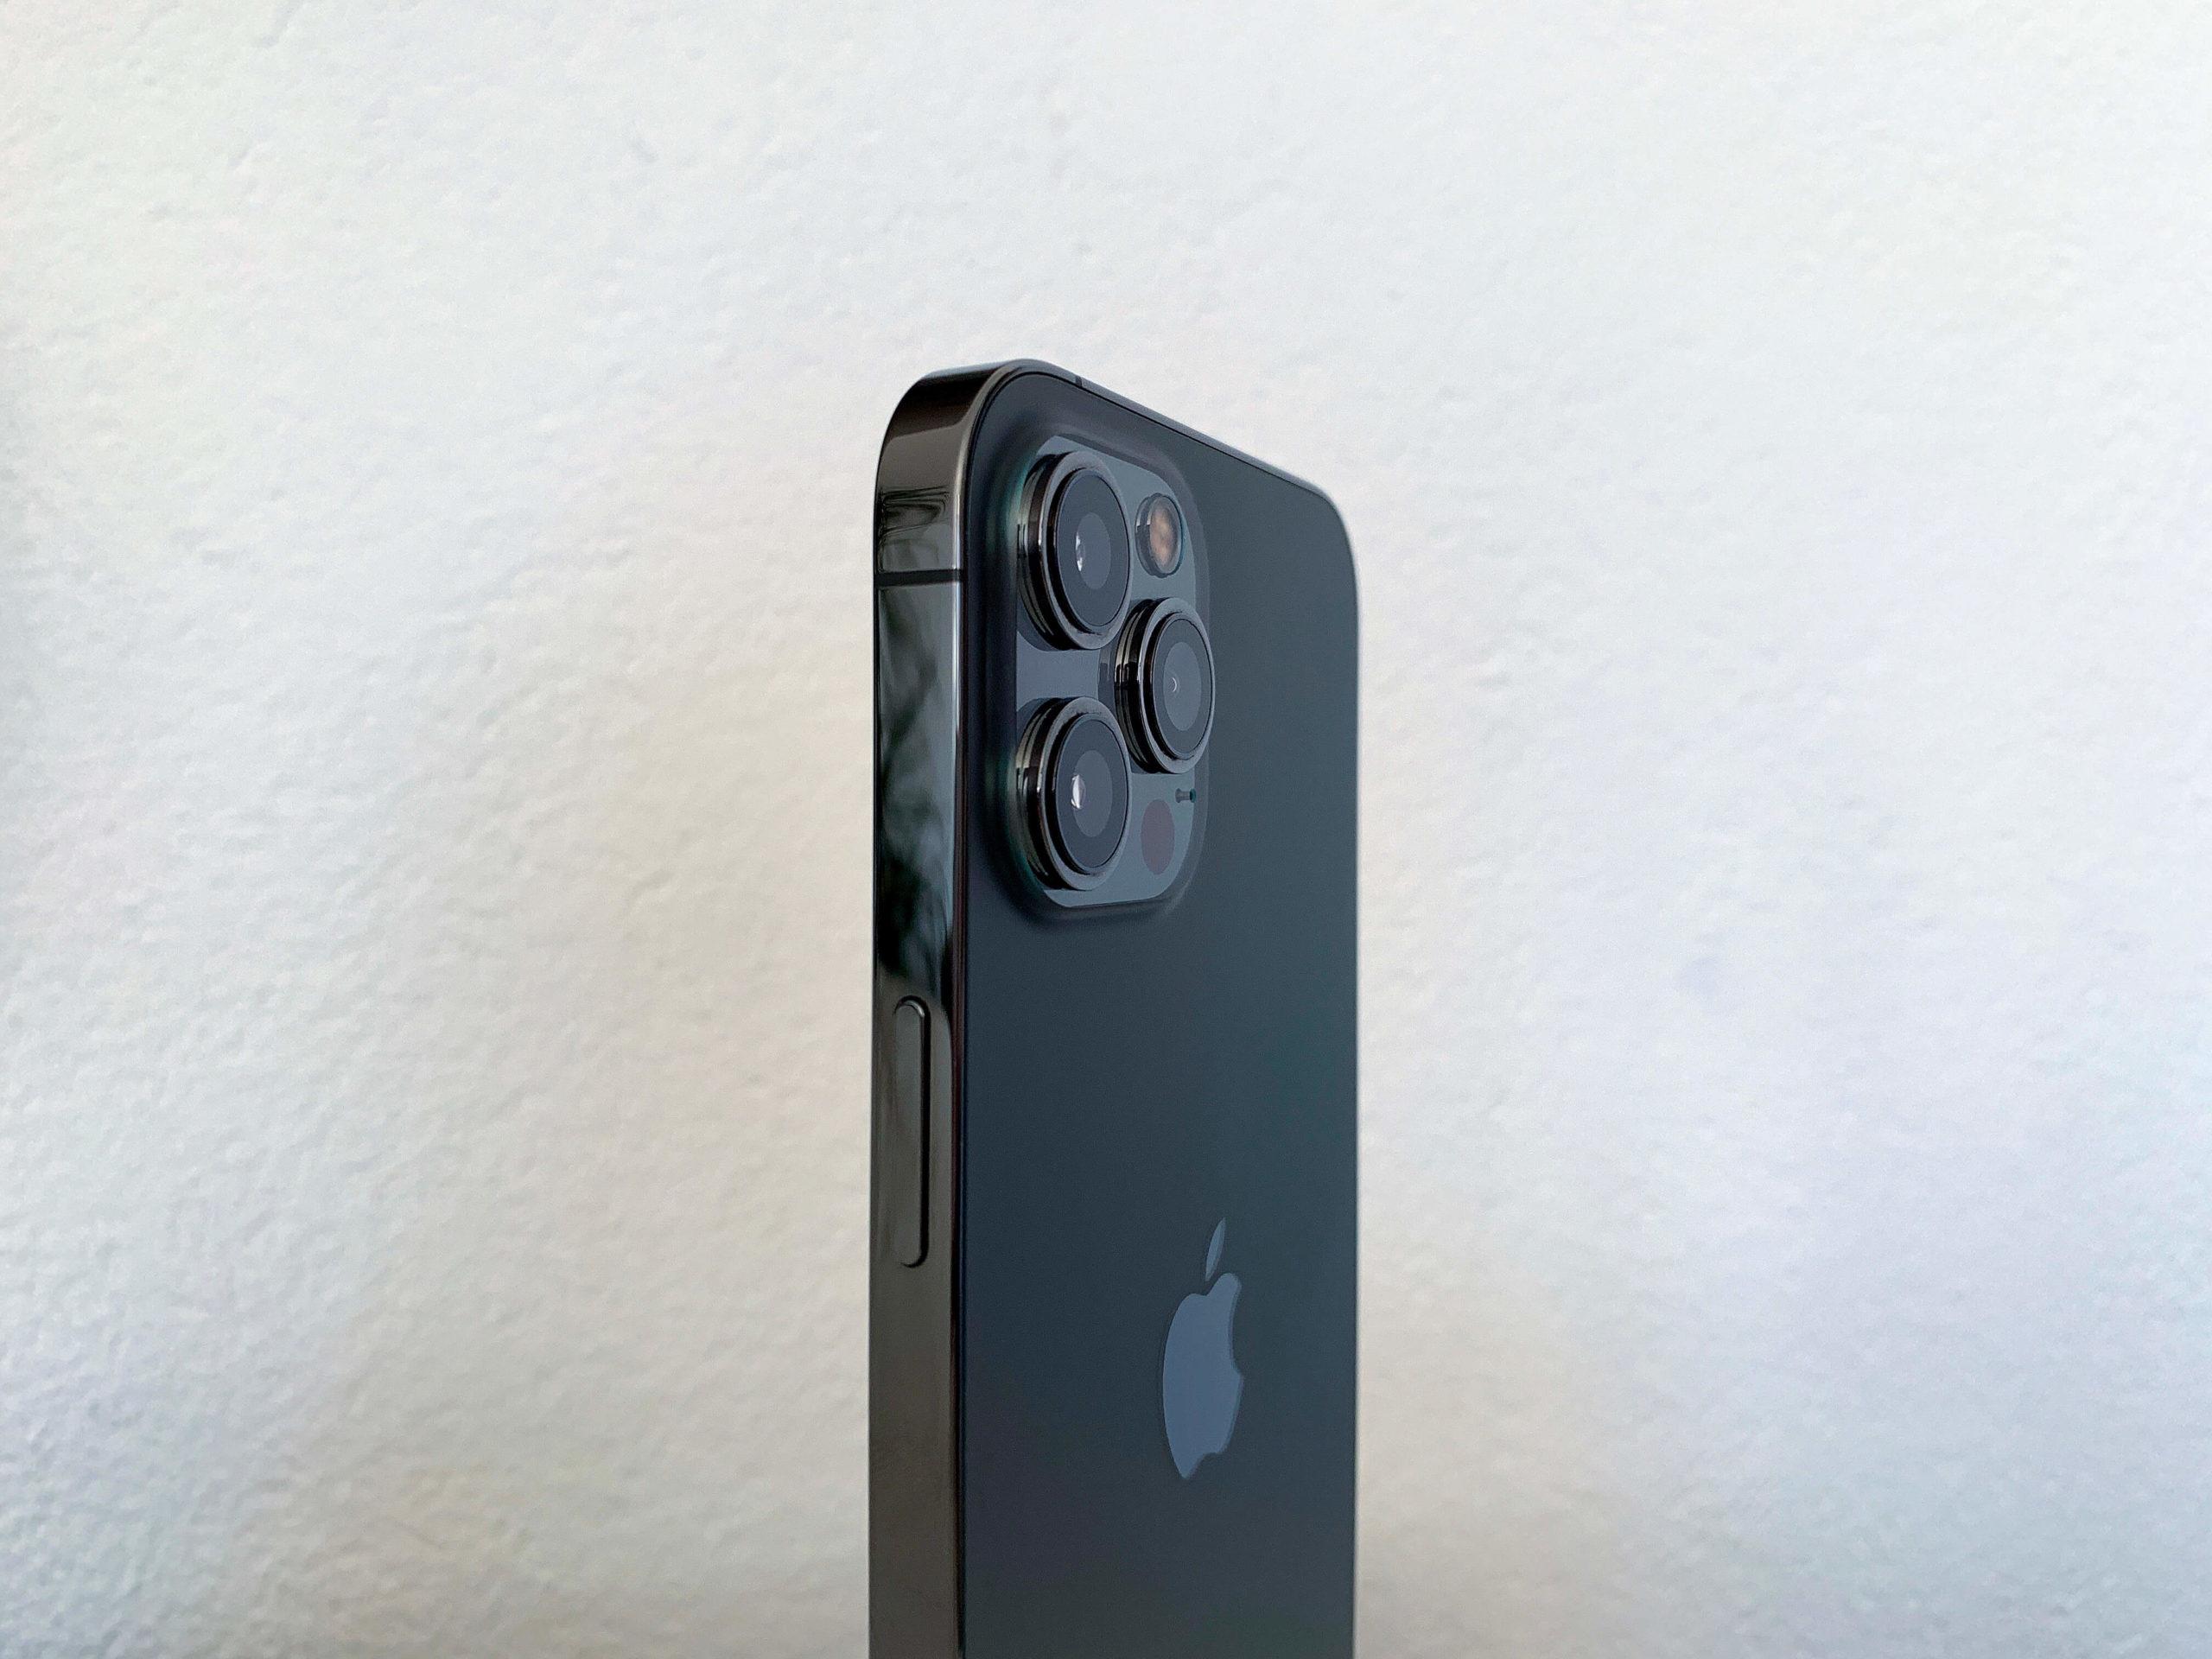 Das_iPhone_12_Pro_Max_Review_Kolumne1-scaled Das iPhone 12 Pro Max